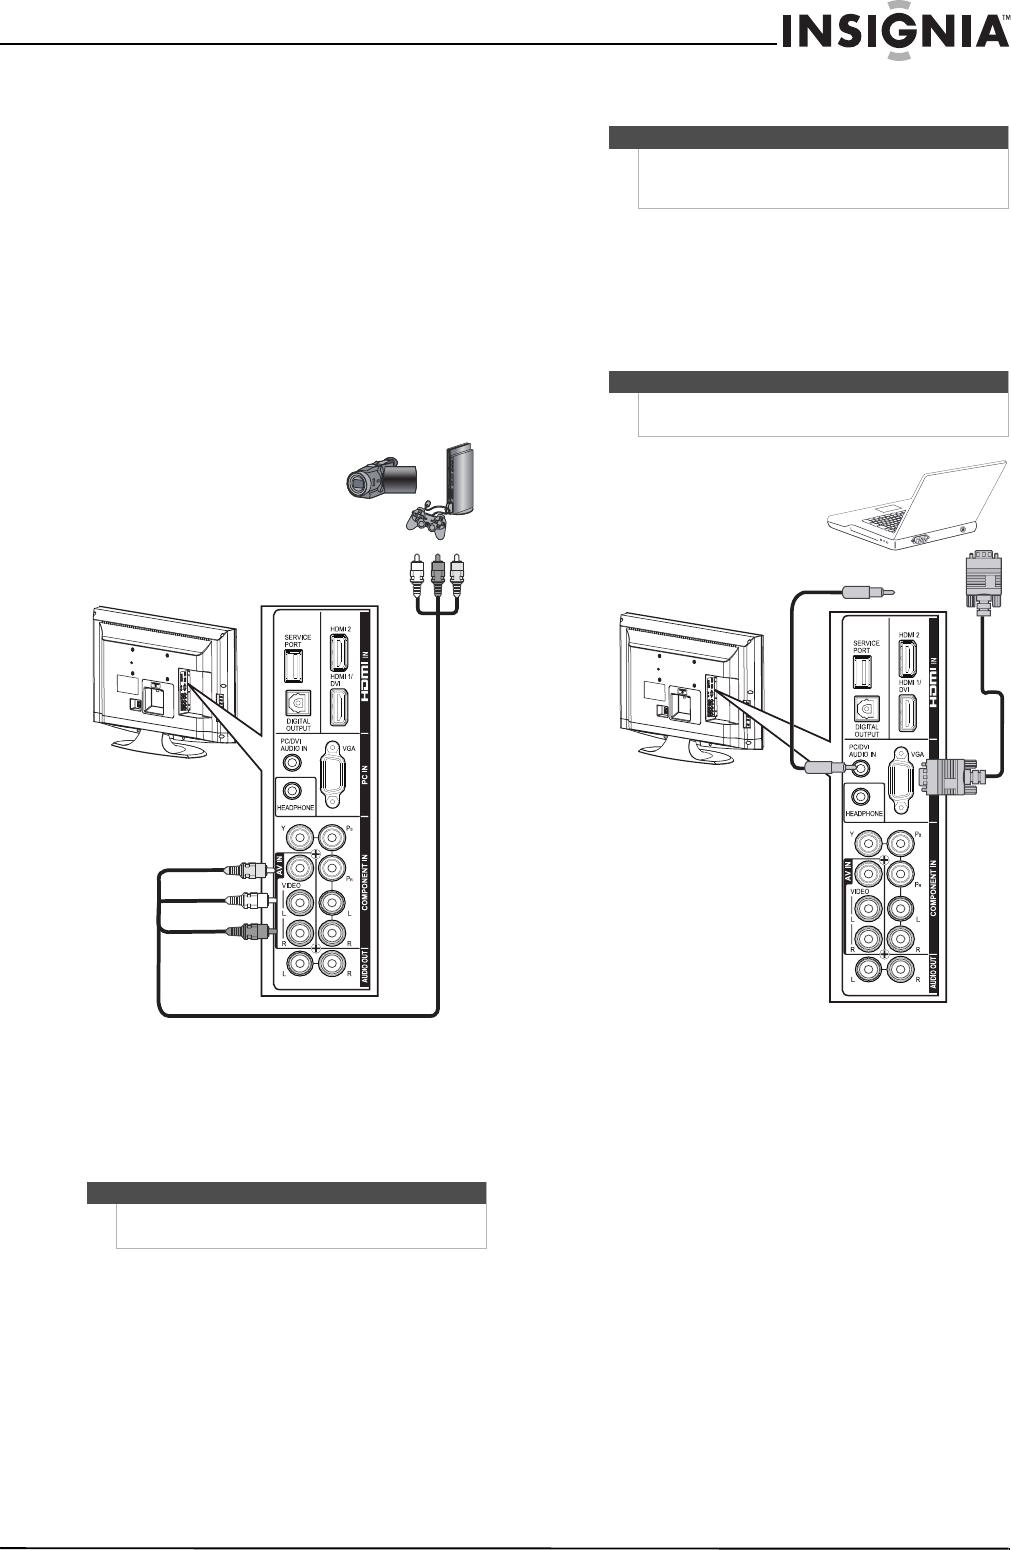 Insignia Ns 32l430a11 User Manual To The 06bf8e02 08d9 4fa2 B74b 1966 Mustang Philco Radio Wiring Diagram 15